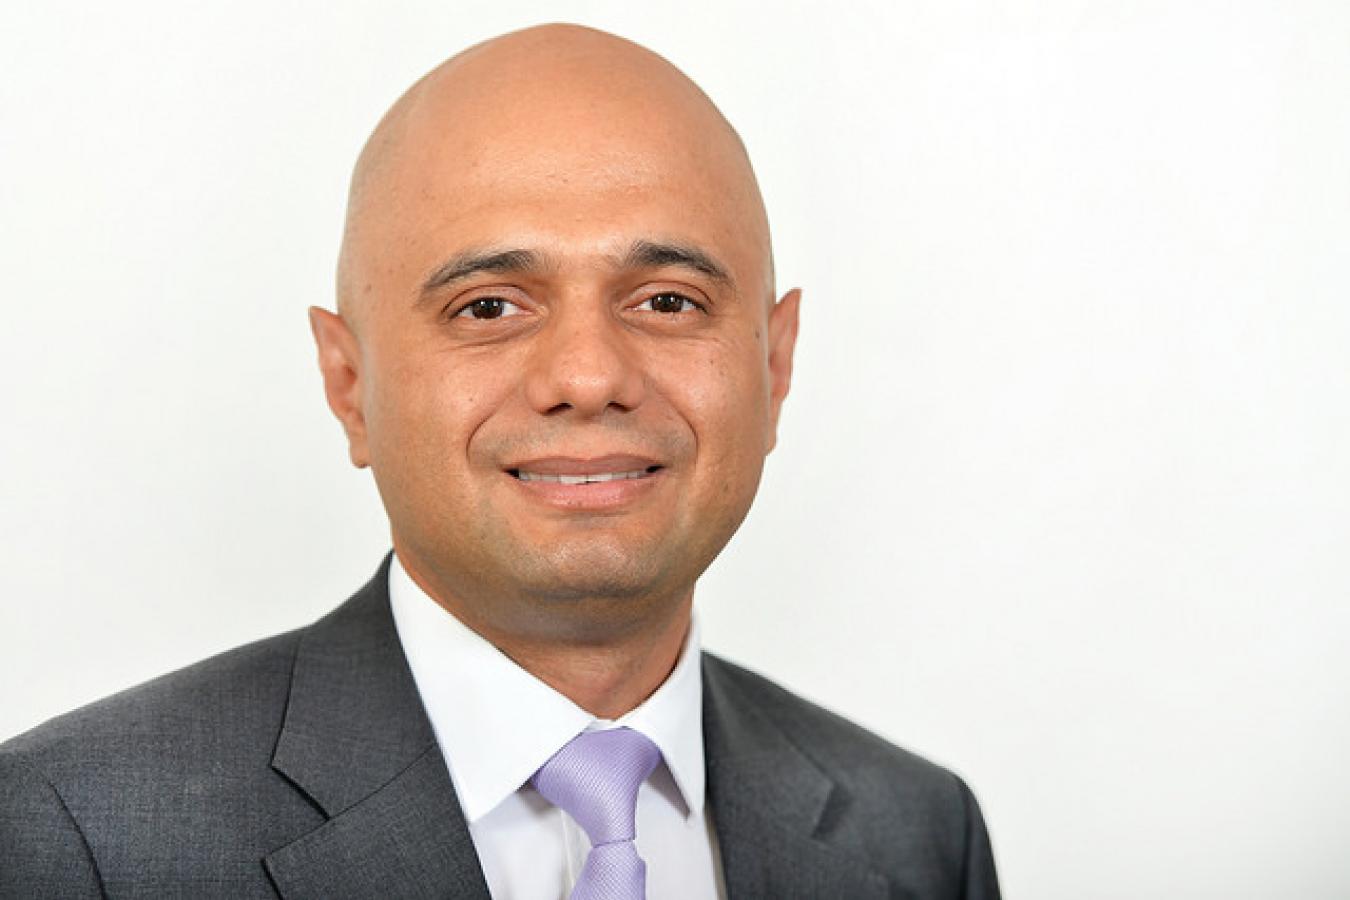 Sajid Javid current Home Secretary